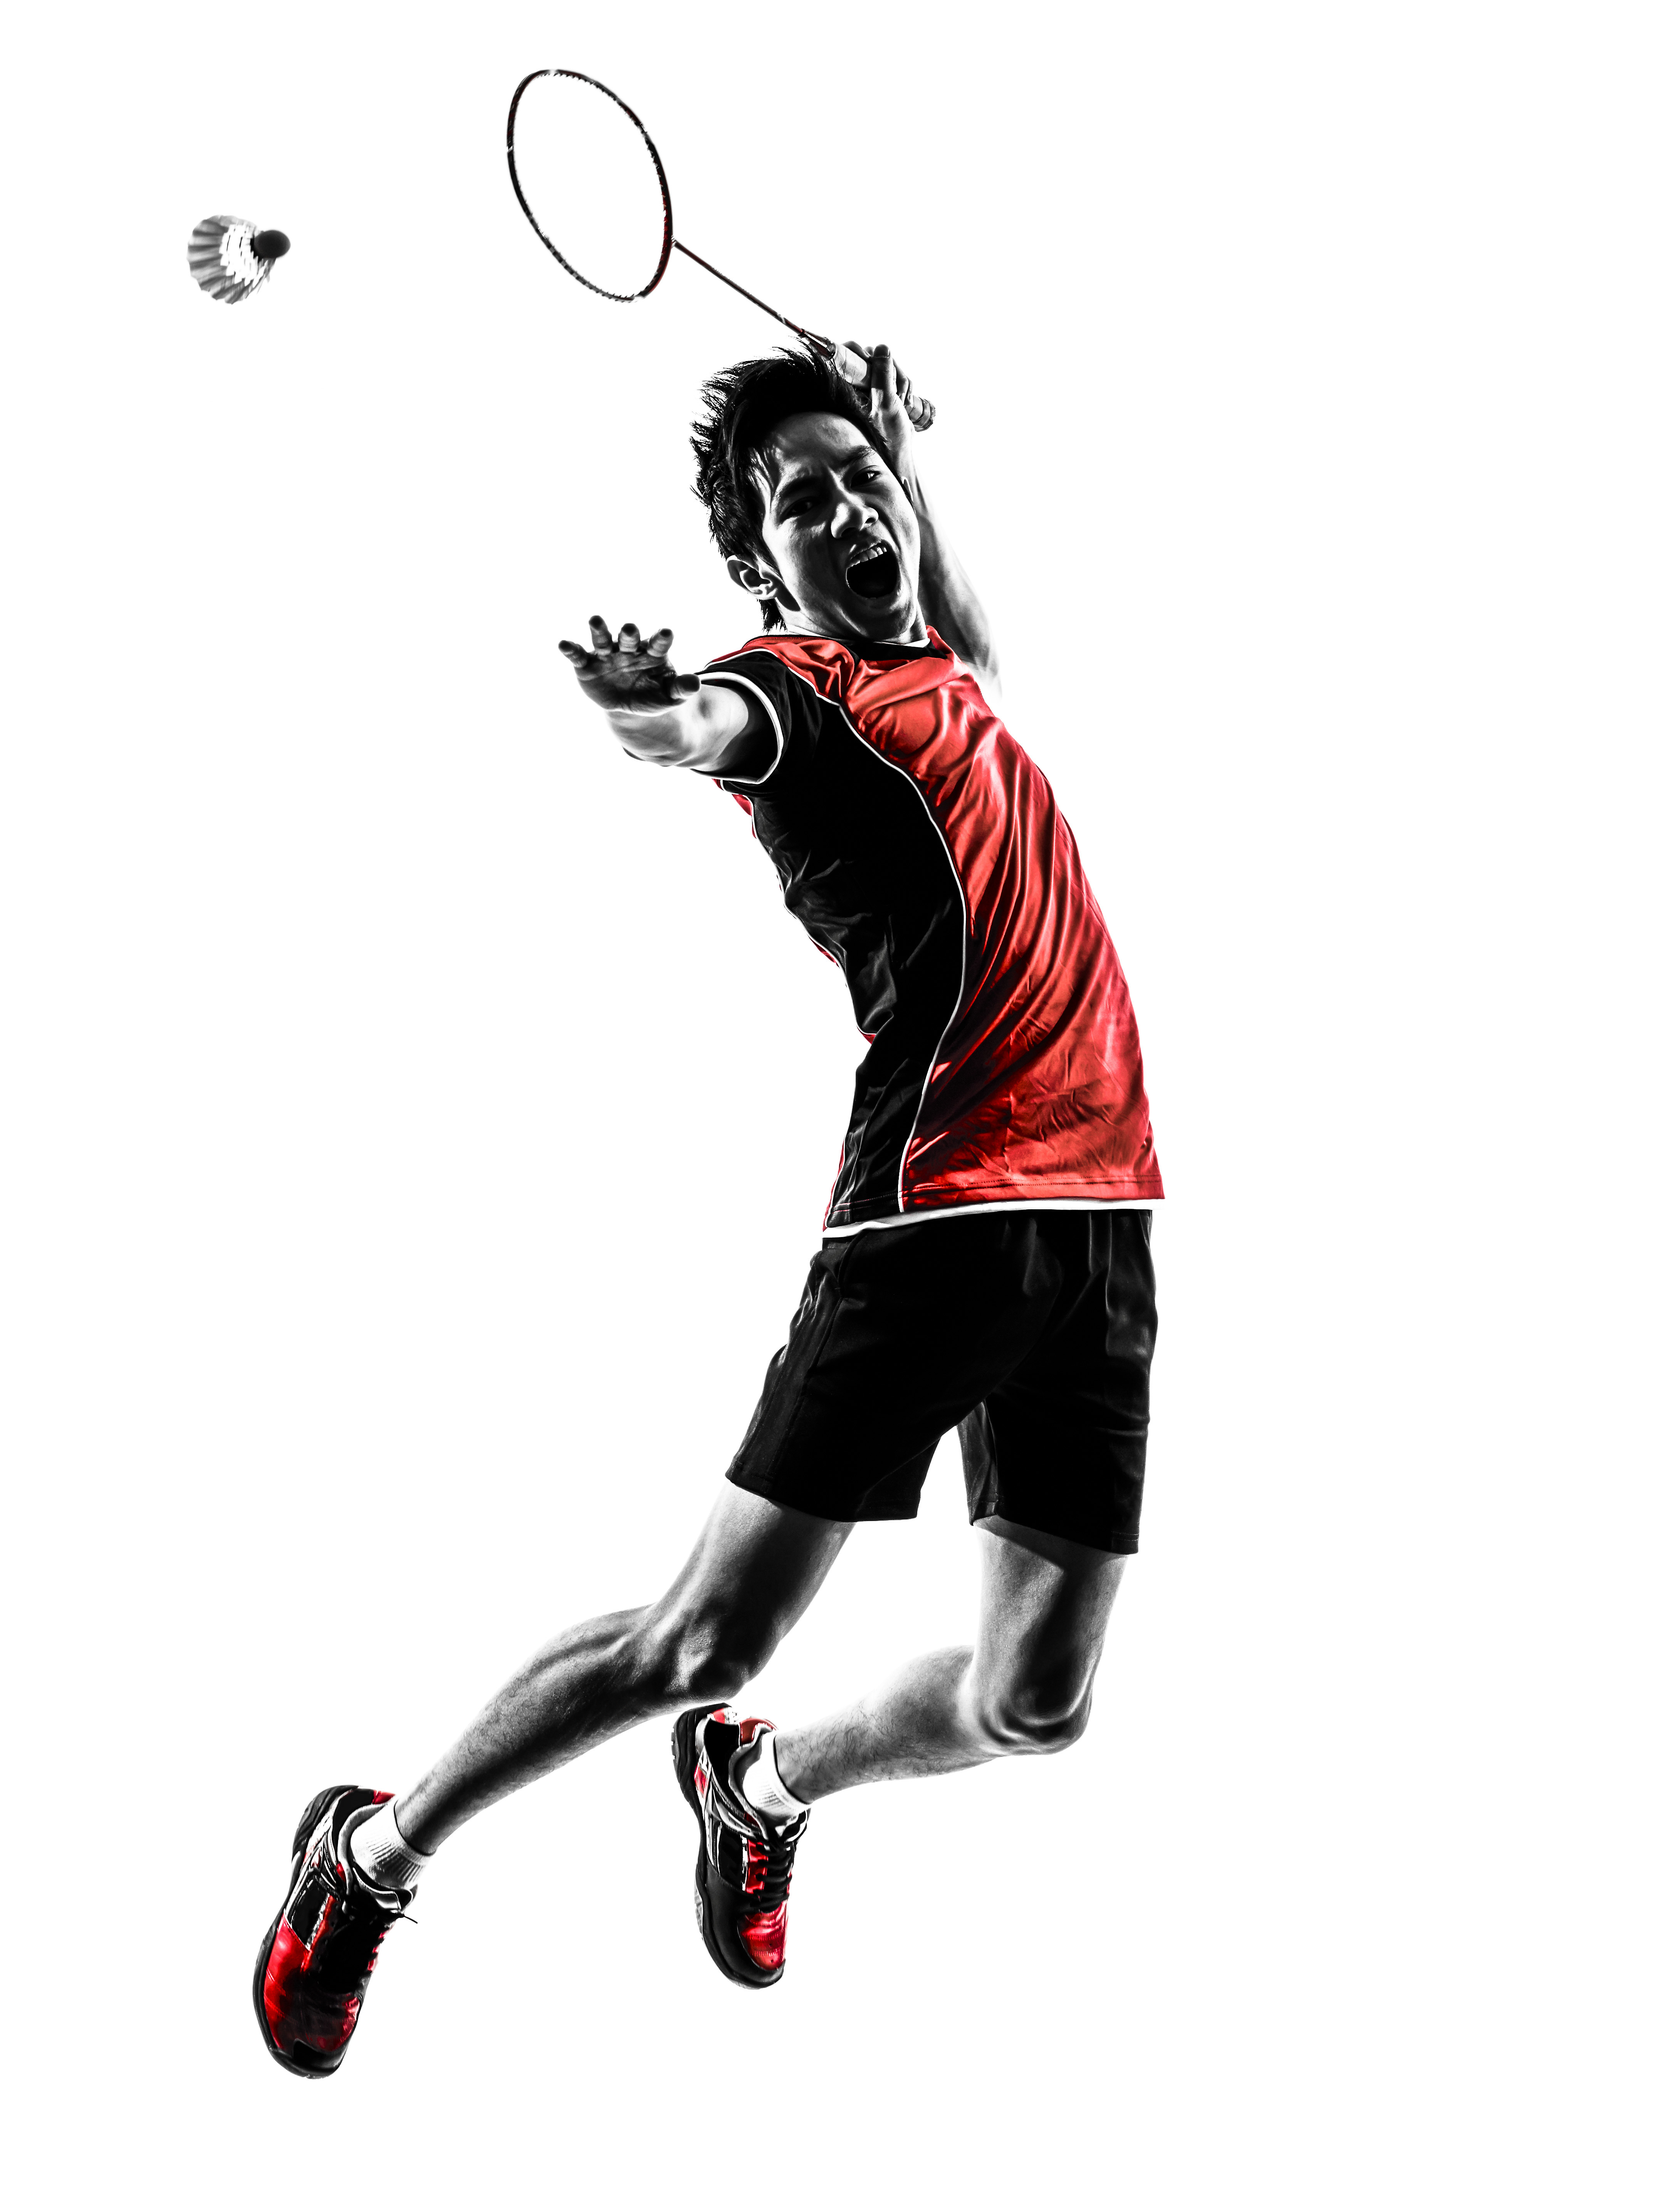 Badminton Smash Clipart Smash Badminton are If a